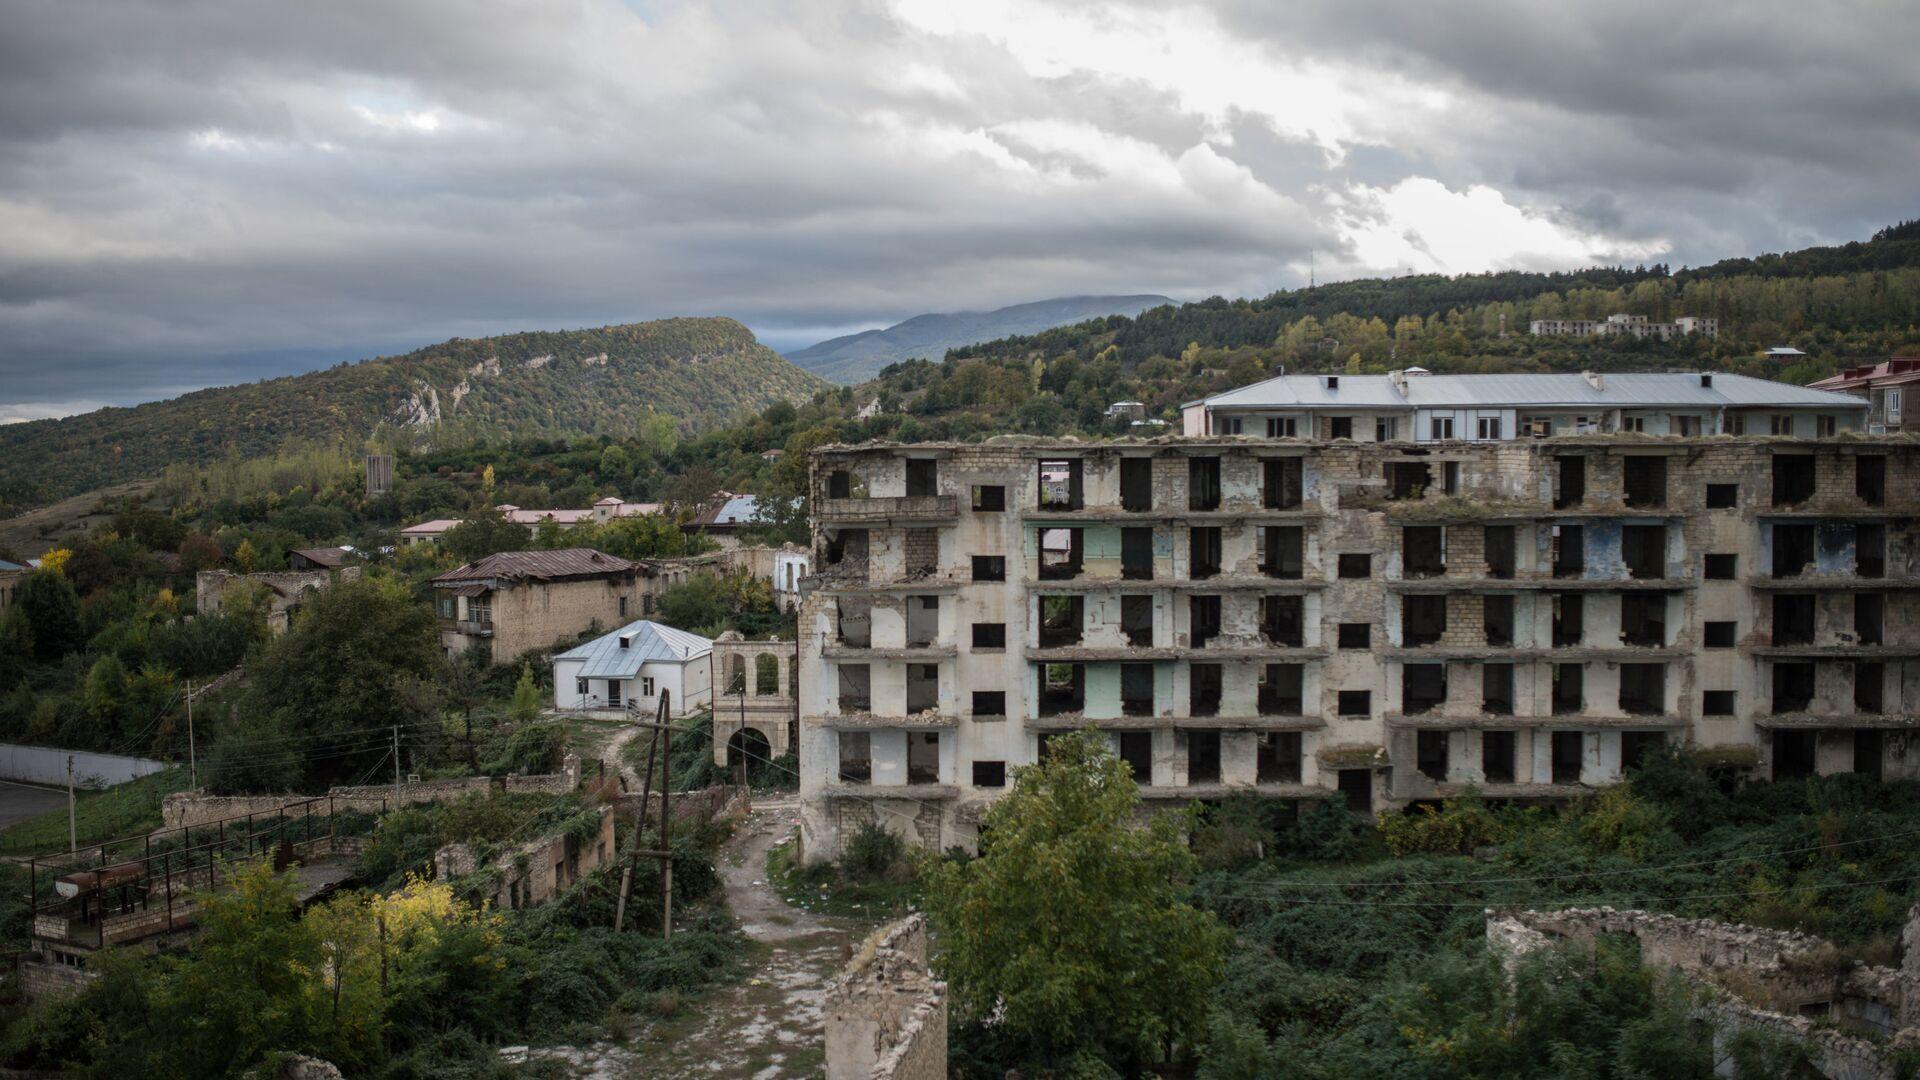 Case distrutte a Nagorno-Karabakh - Sputnik Italia, 1920, 28.05.2021